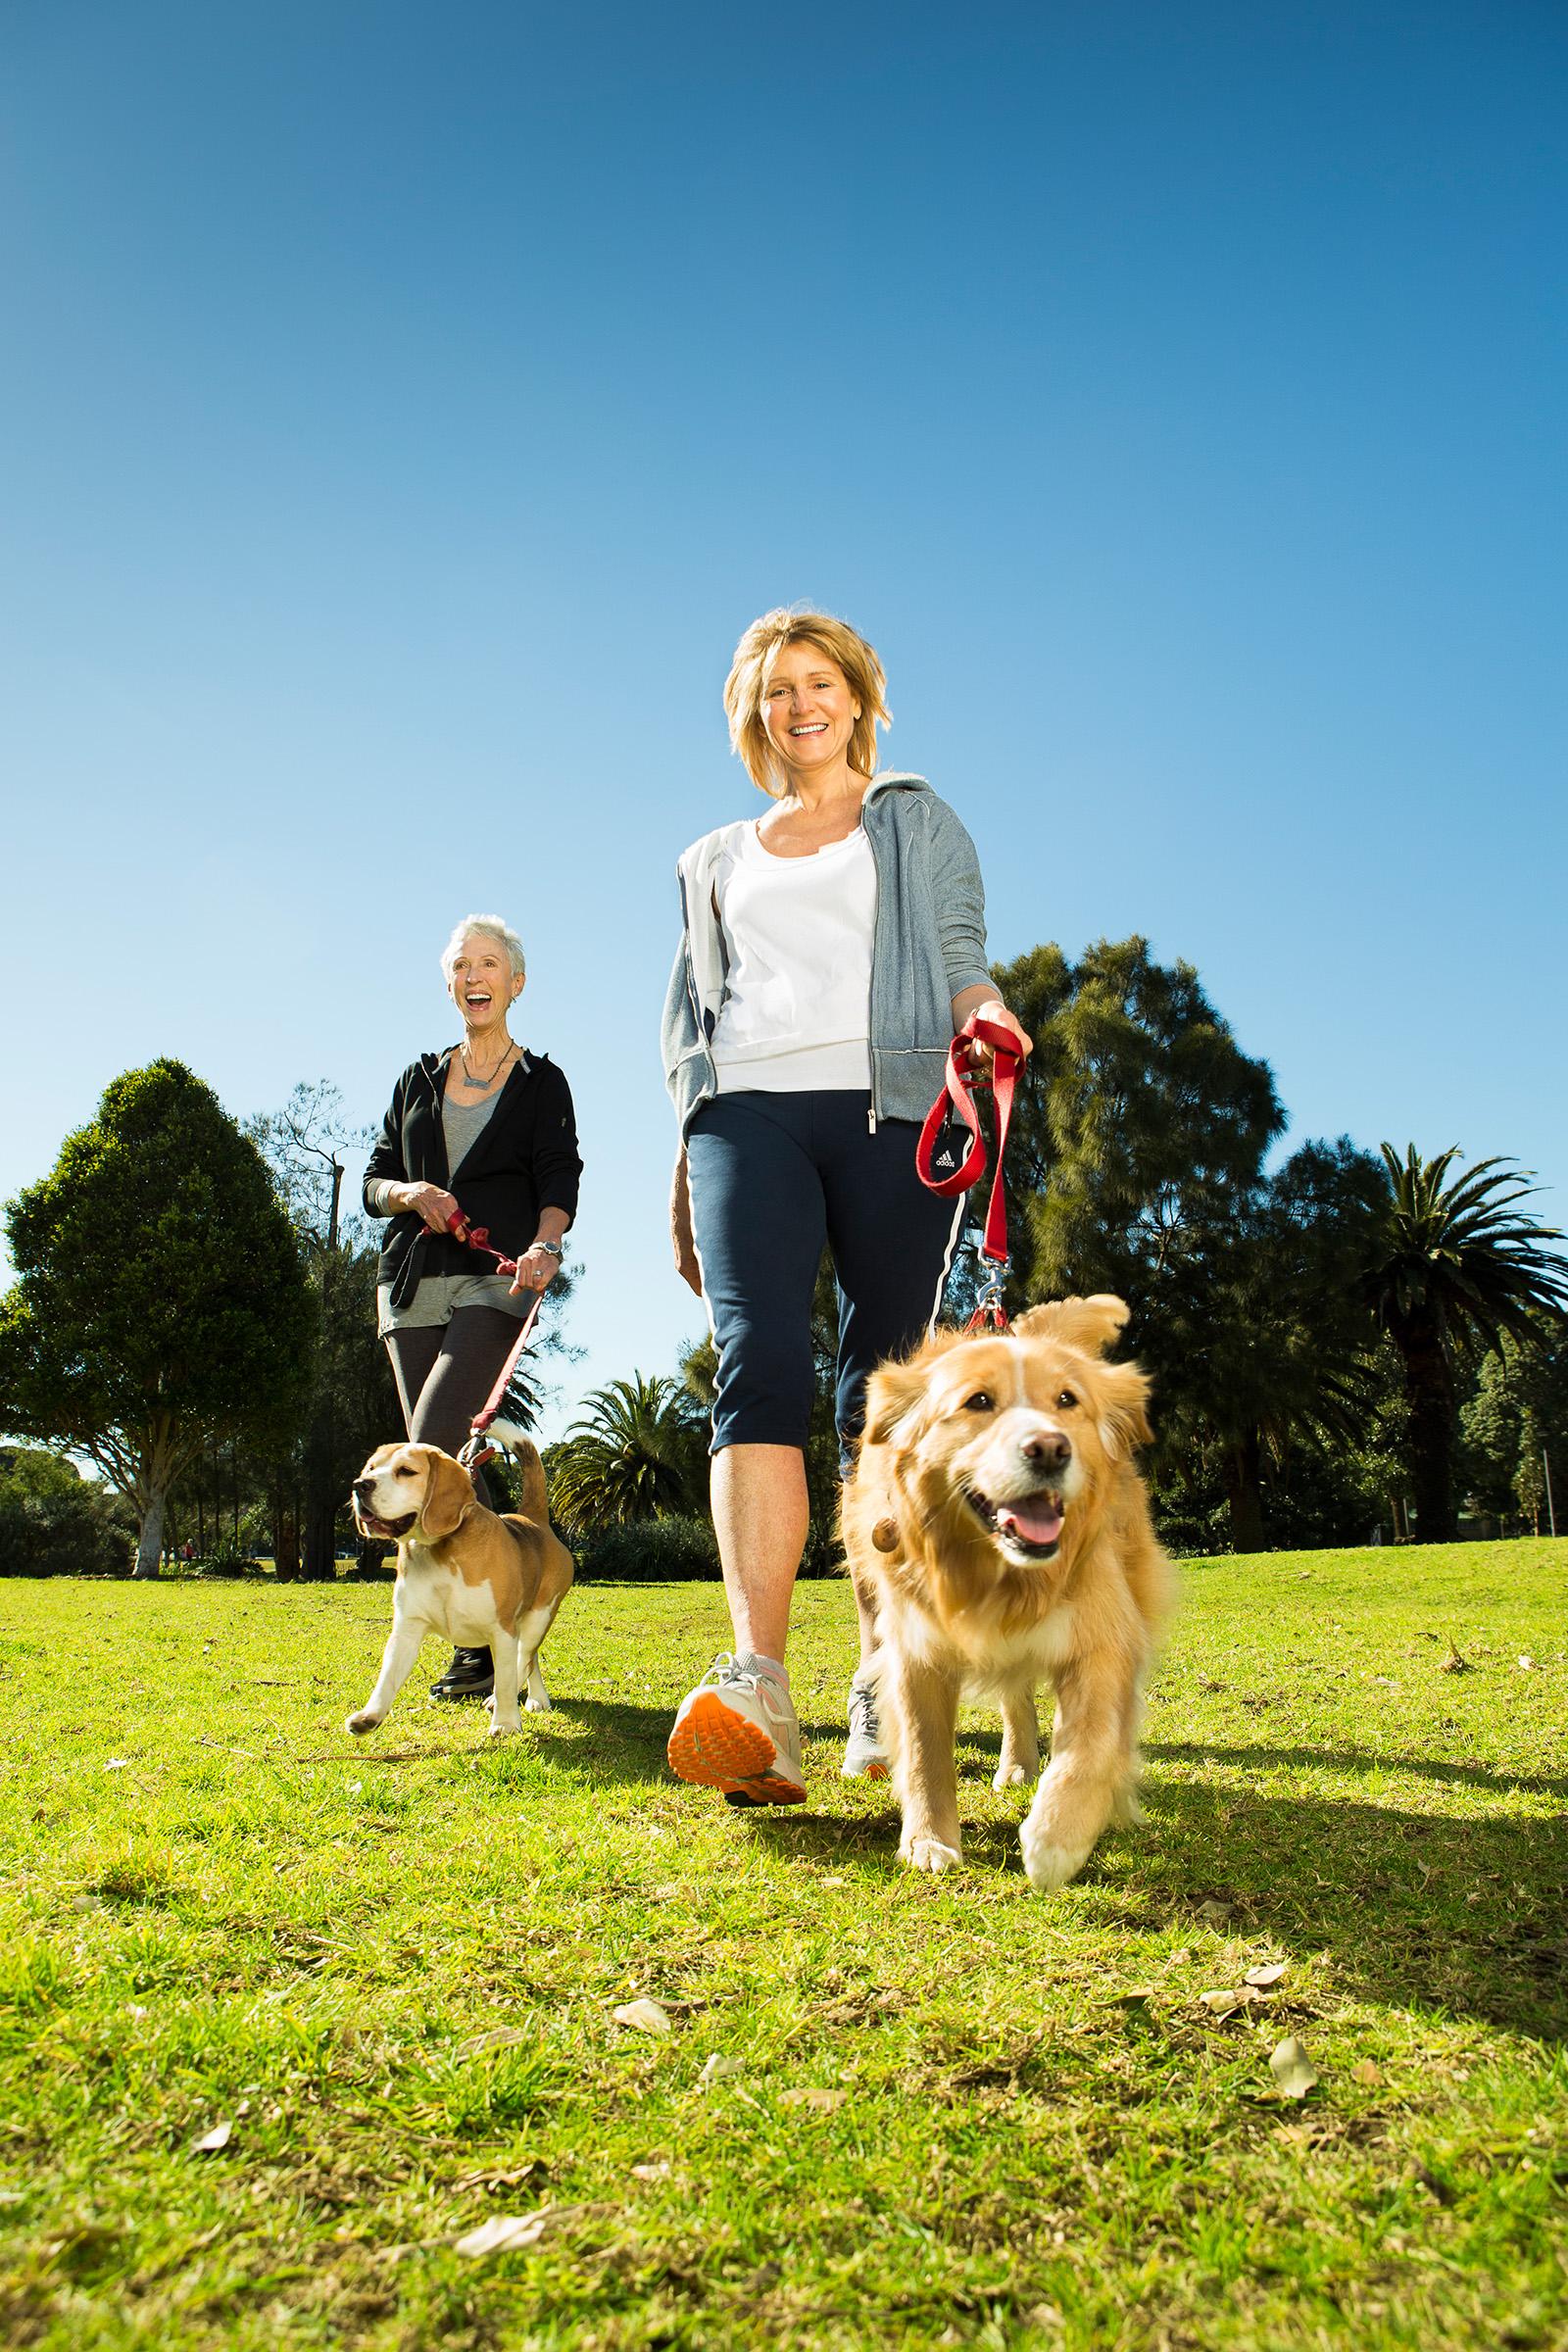 Active Retirees Beagle Border Collie dog park walk